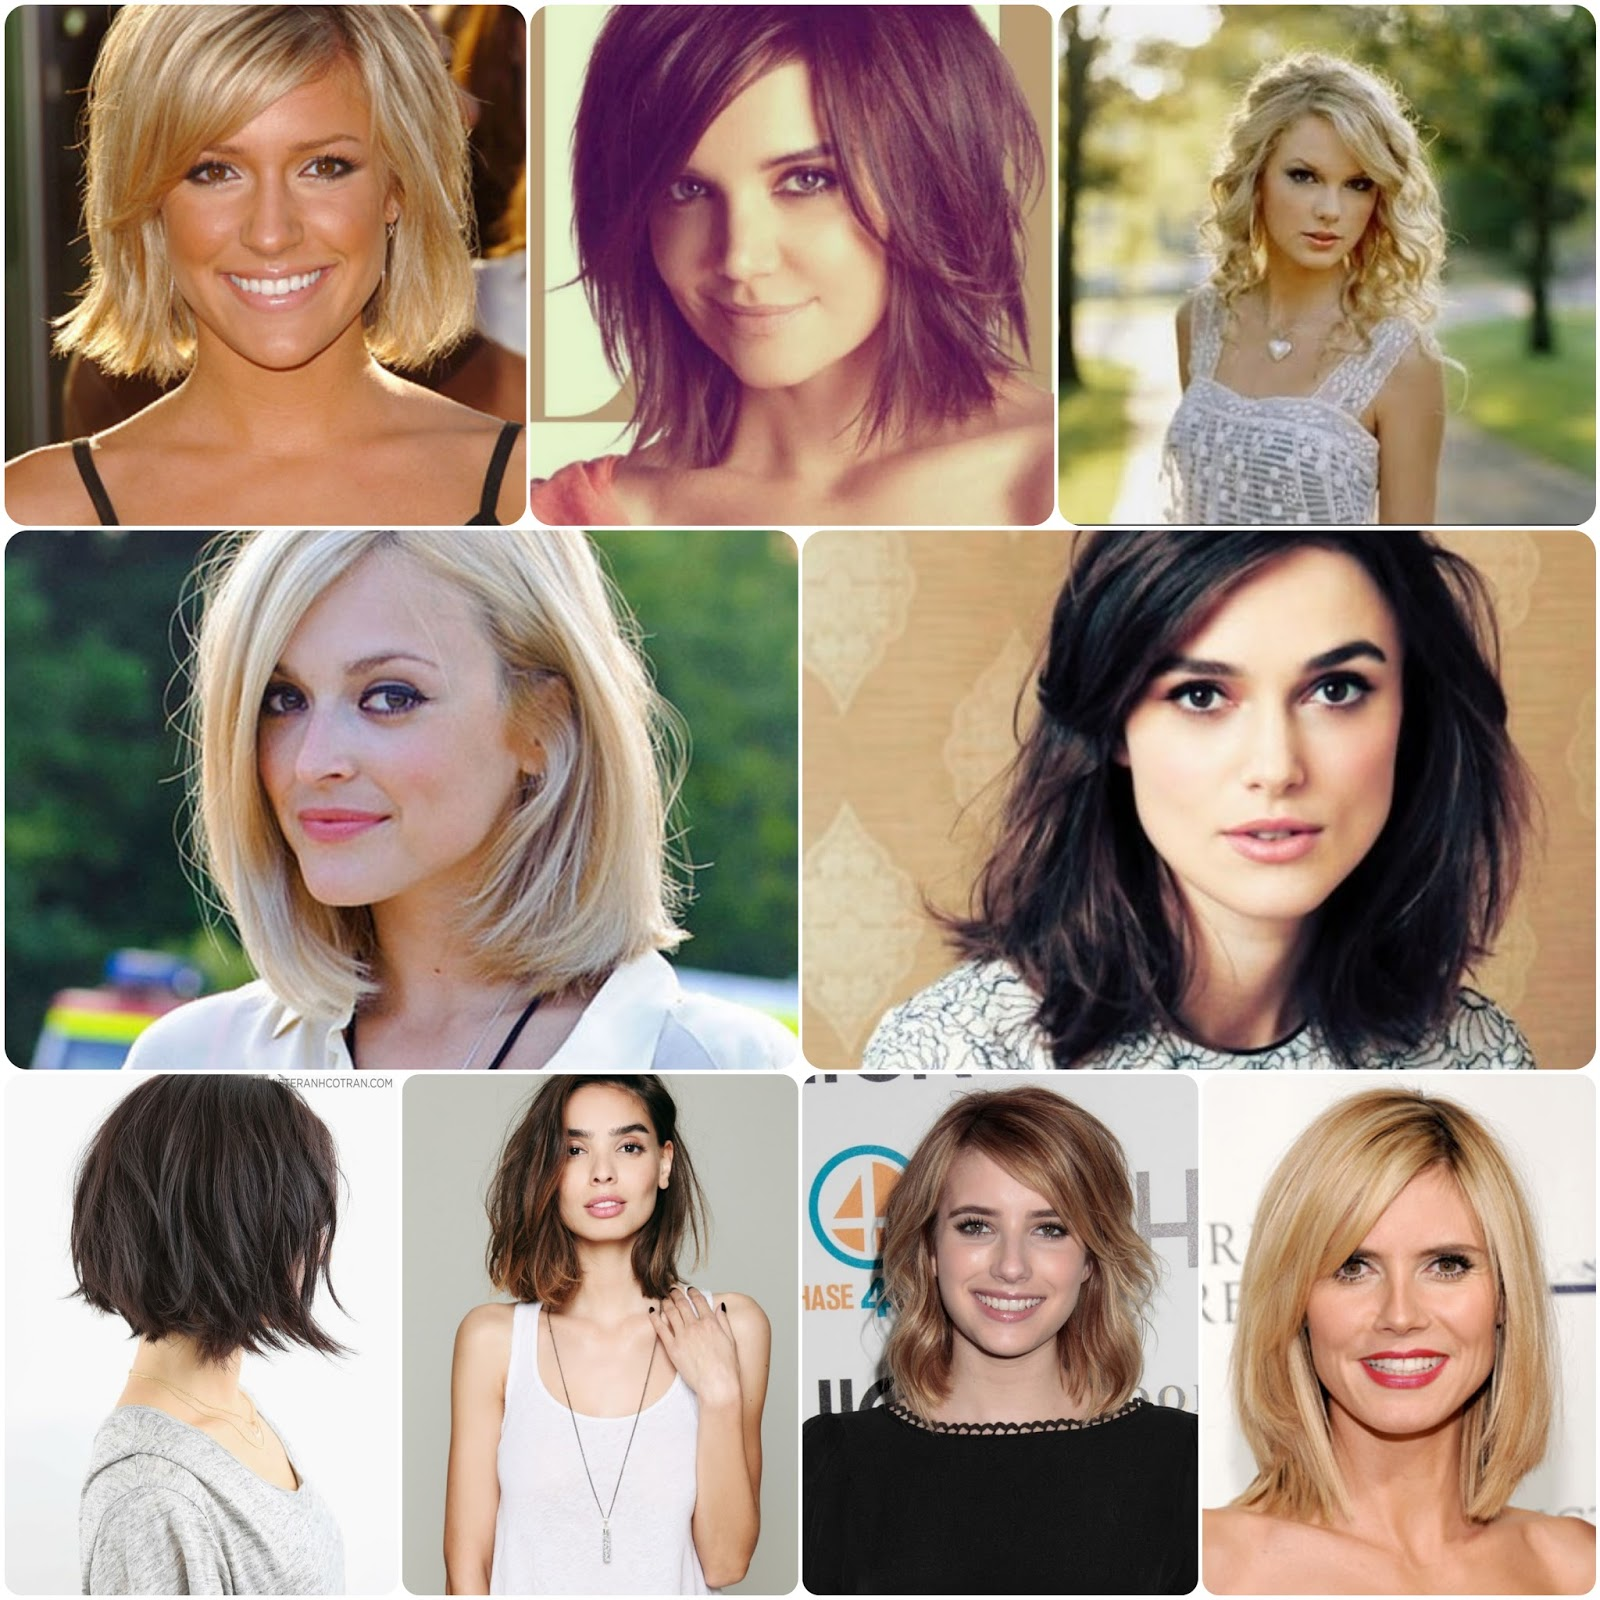 Enjoy Today With Estelloo Les Avantages Des Cheveux Longs Et Courts To Cut Or Not To Cut